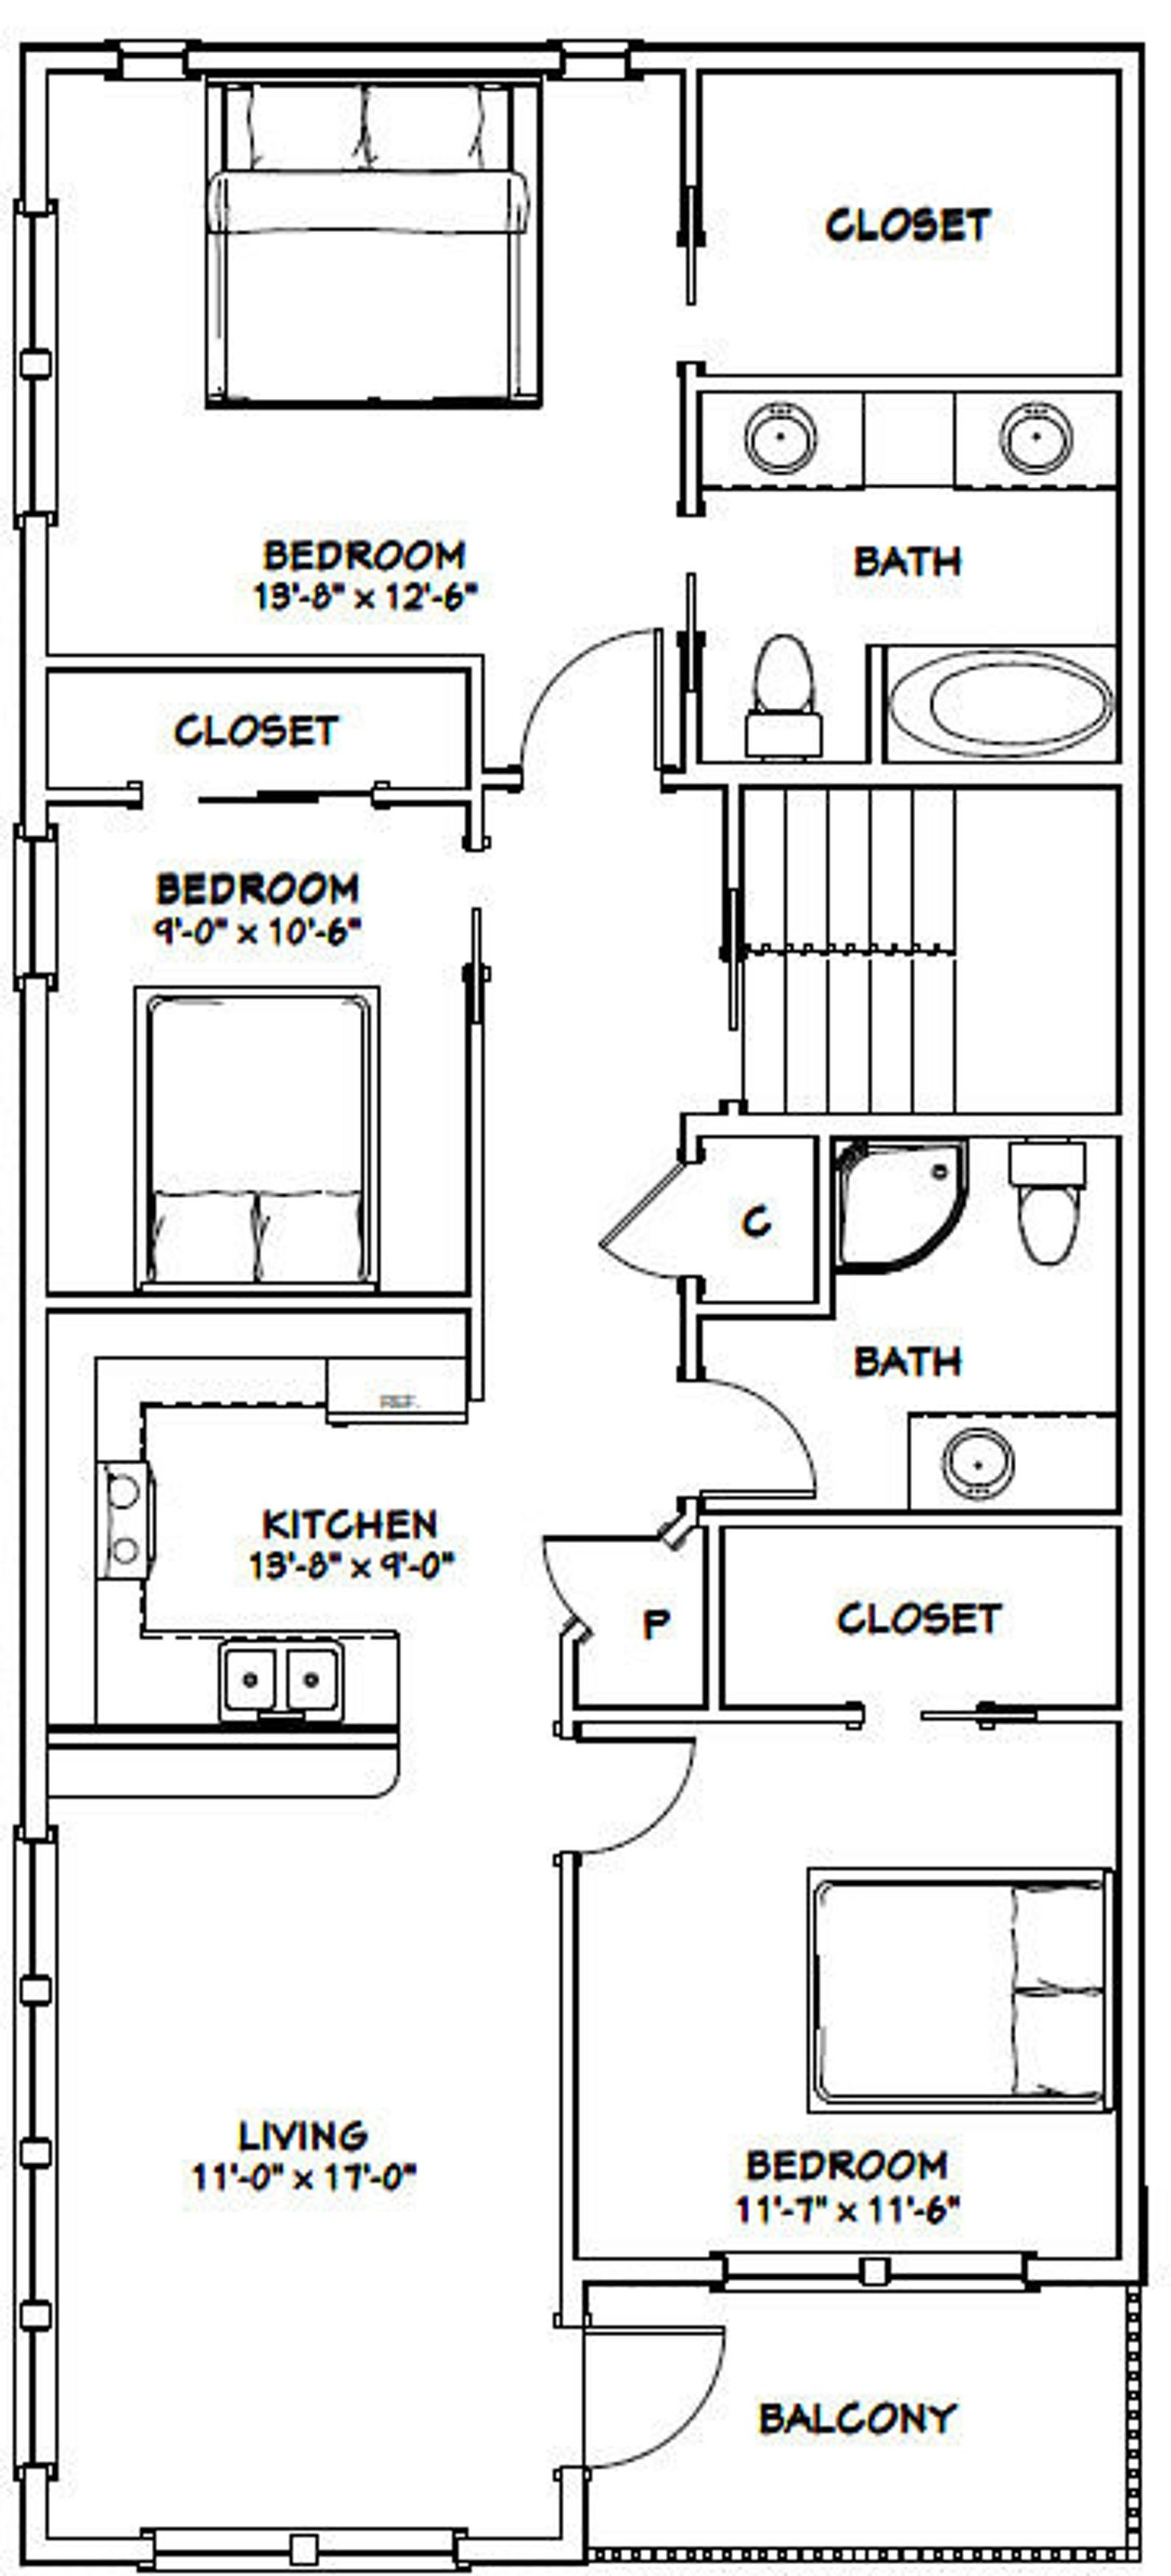 44x48 house  4bedroom 3bath  1645 sq ft  pdf